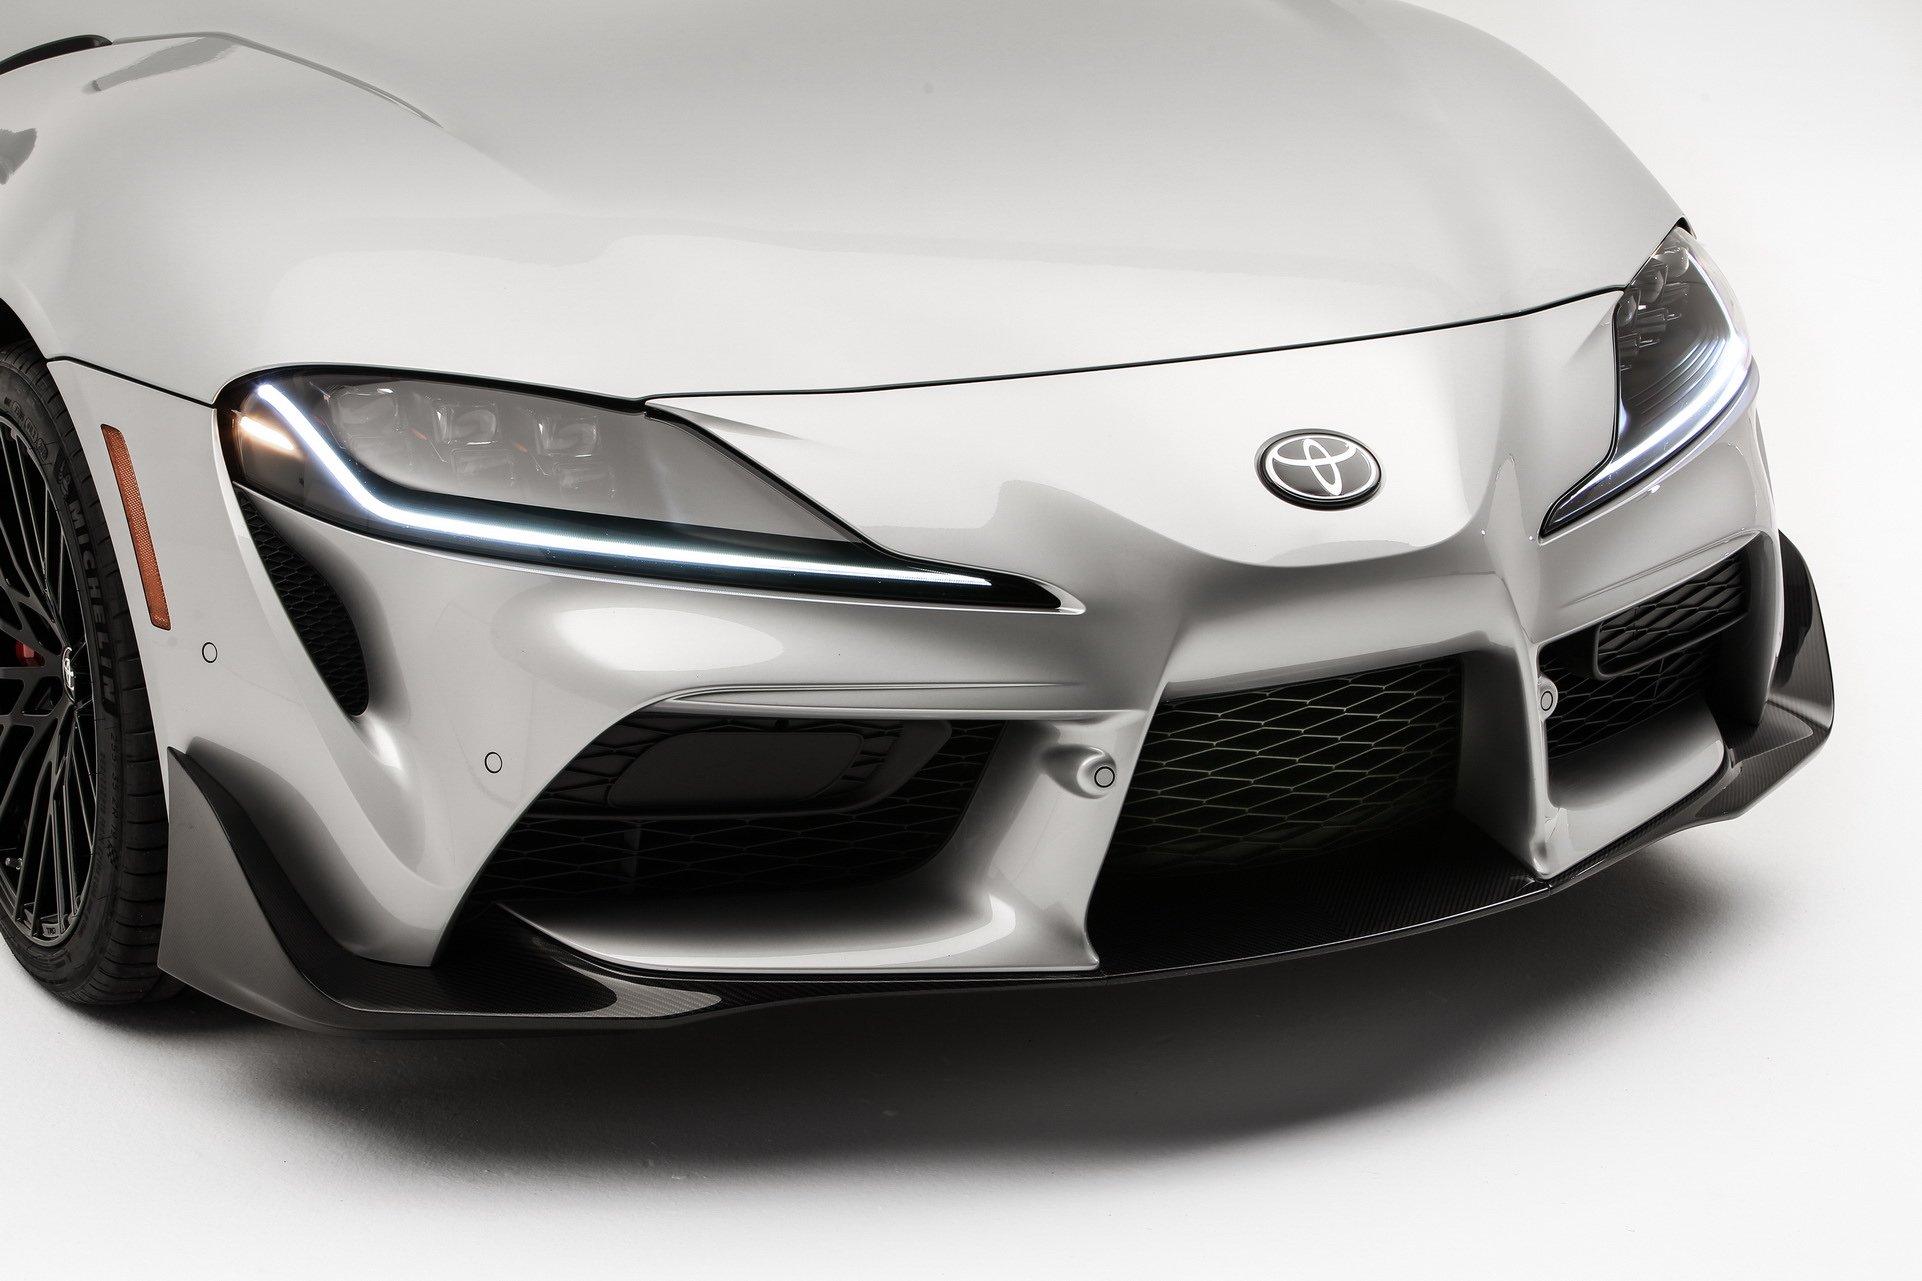 2020-Toyota-GR-Supra-Performance-Line-Concept8